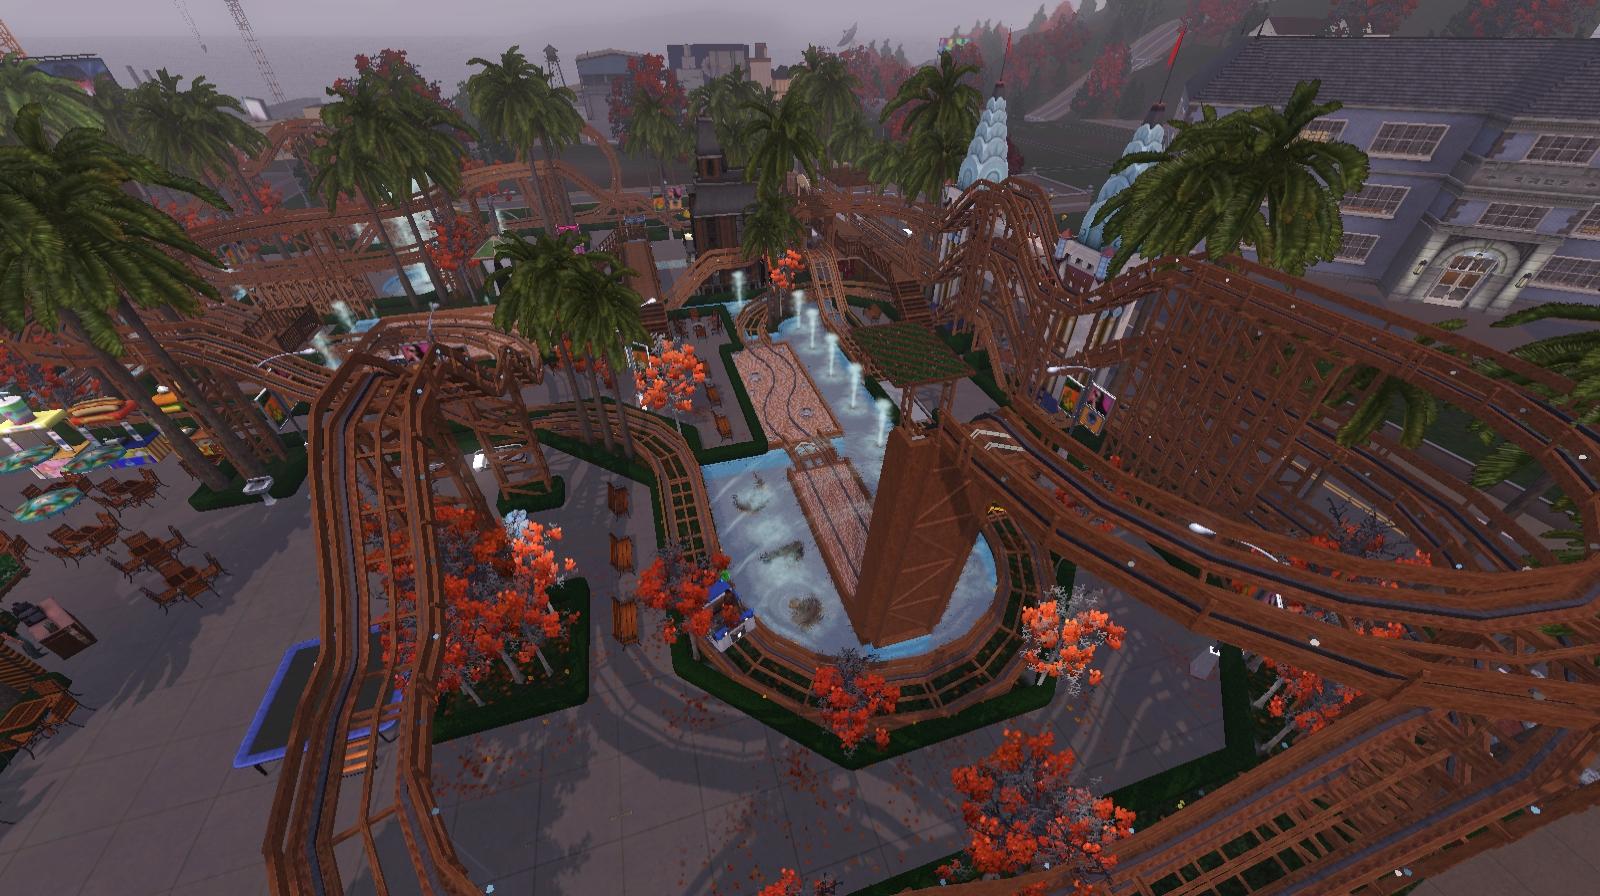 [Descarga] Parque Adventure Park. Screenshot-431